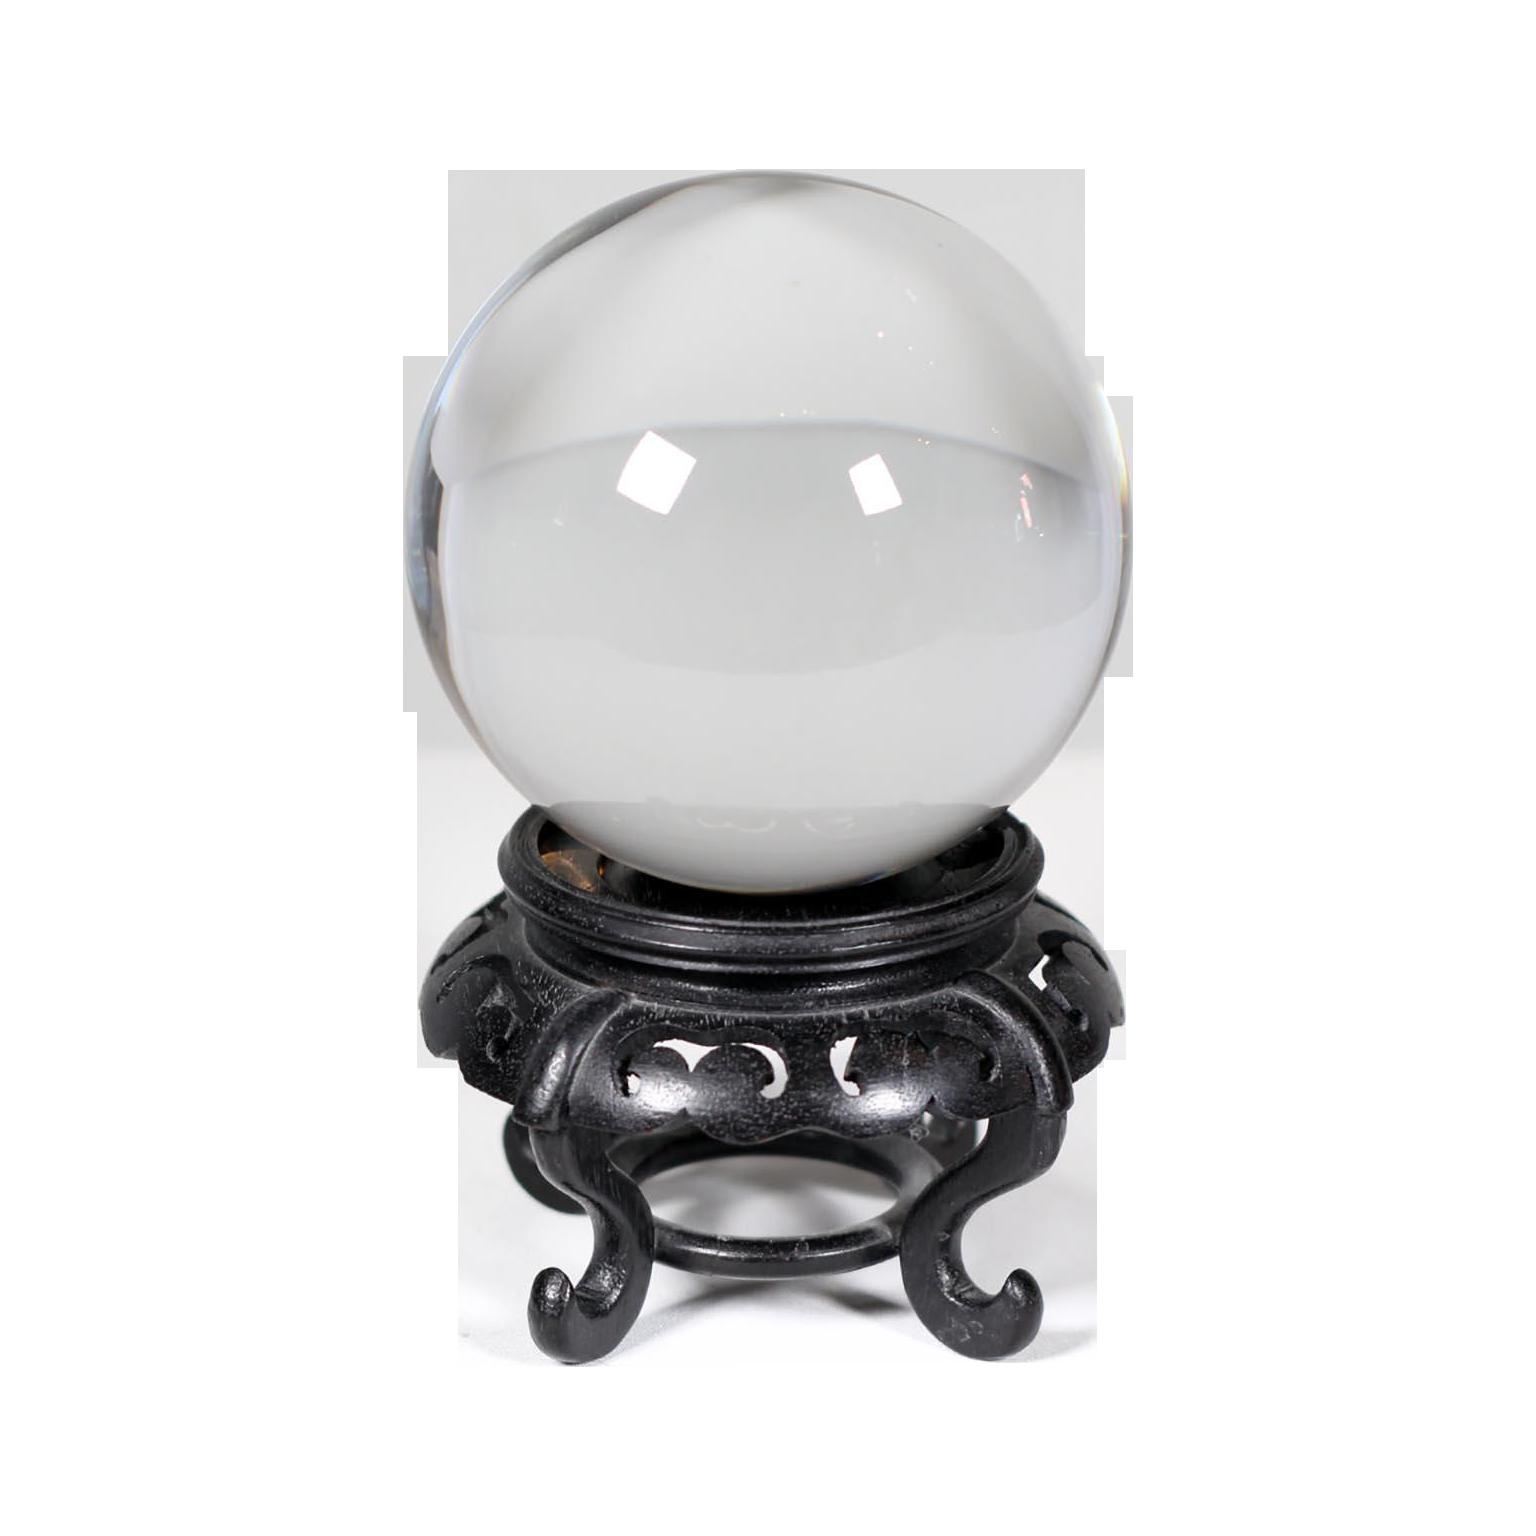 Hardwood Base Chinese Crystal Ball Chairish